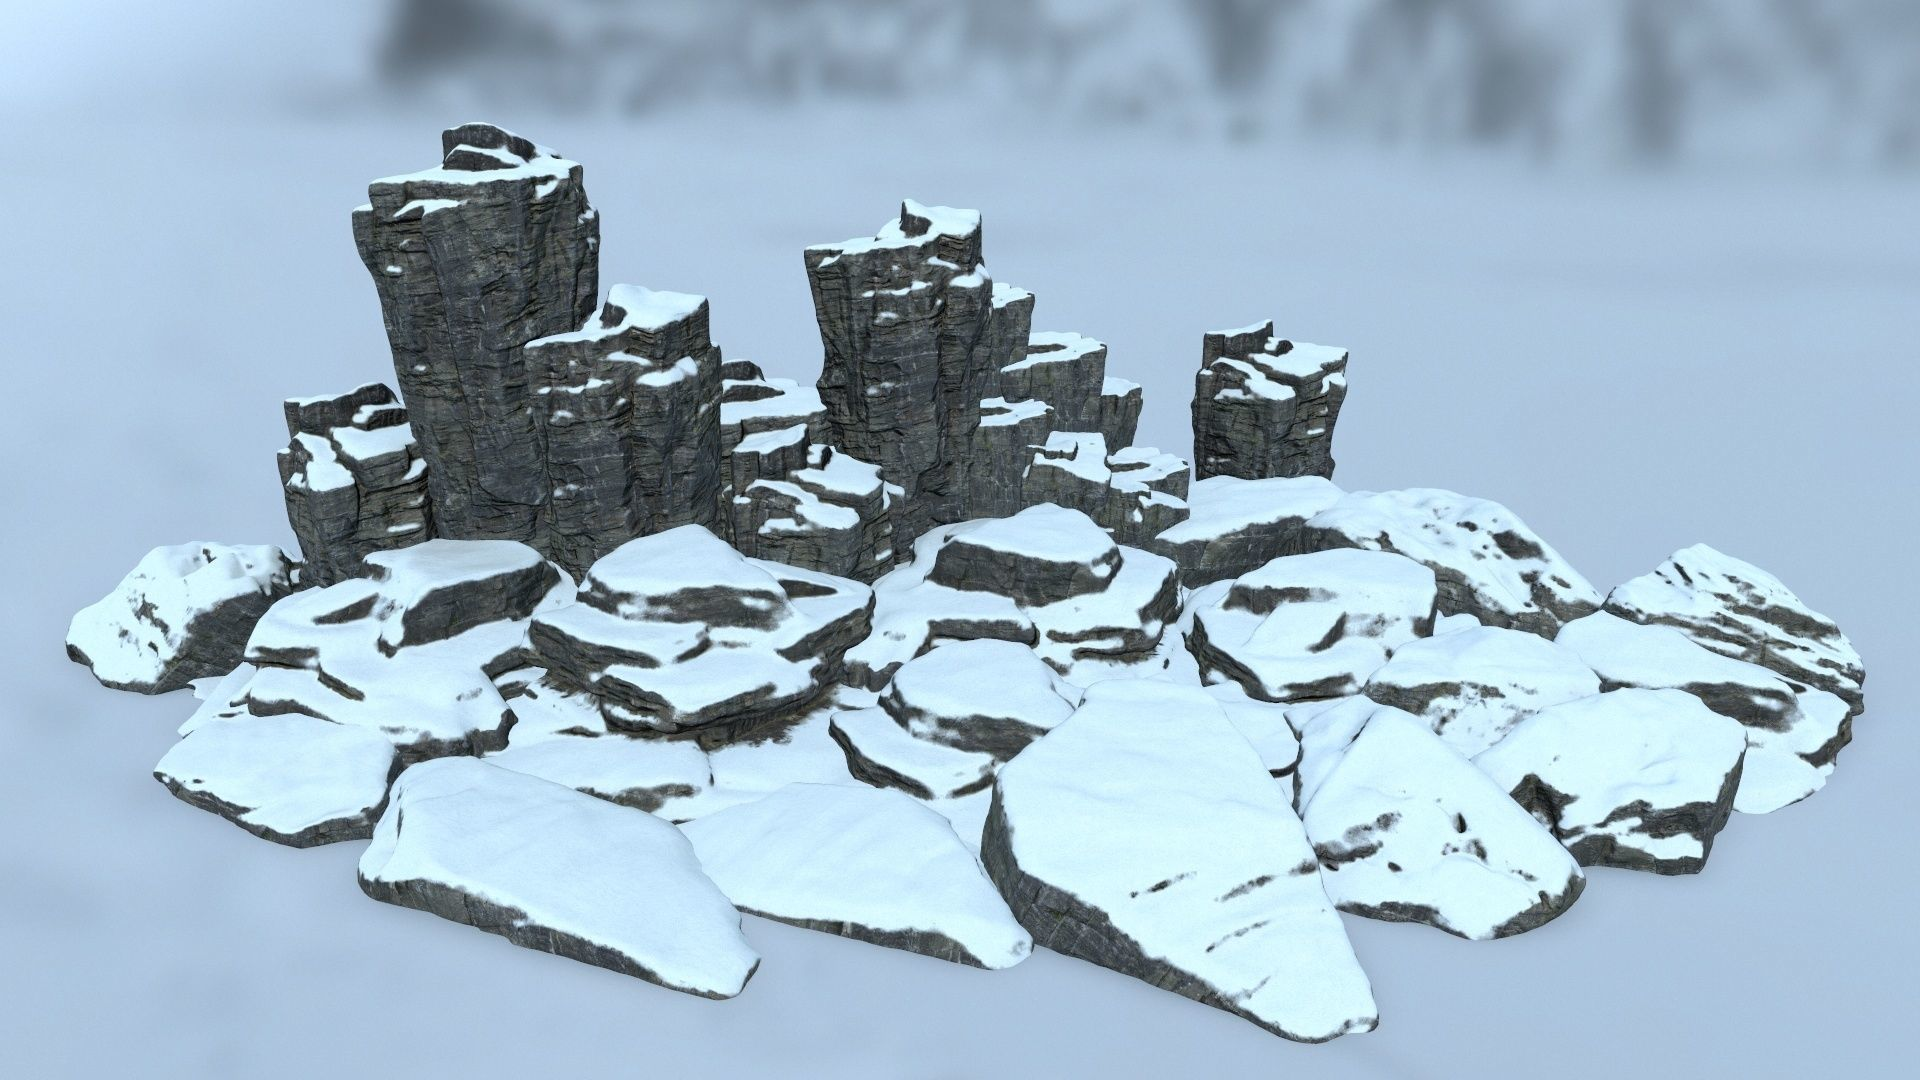 snow cliff rocks